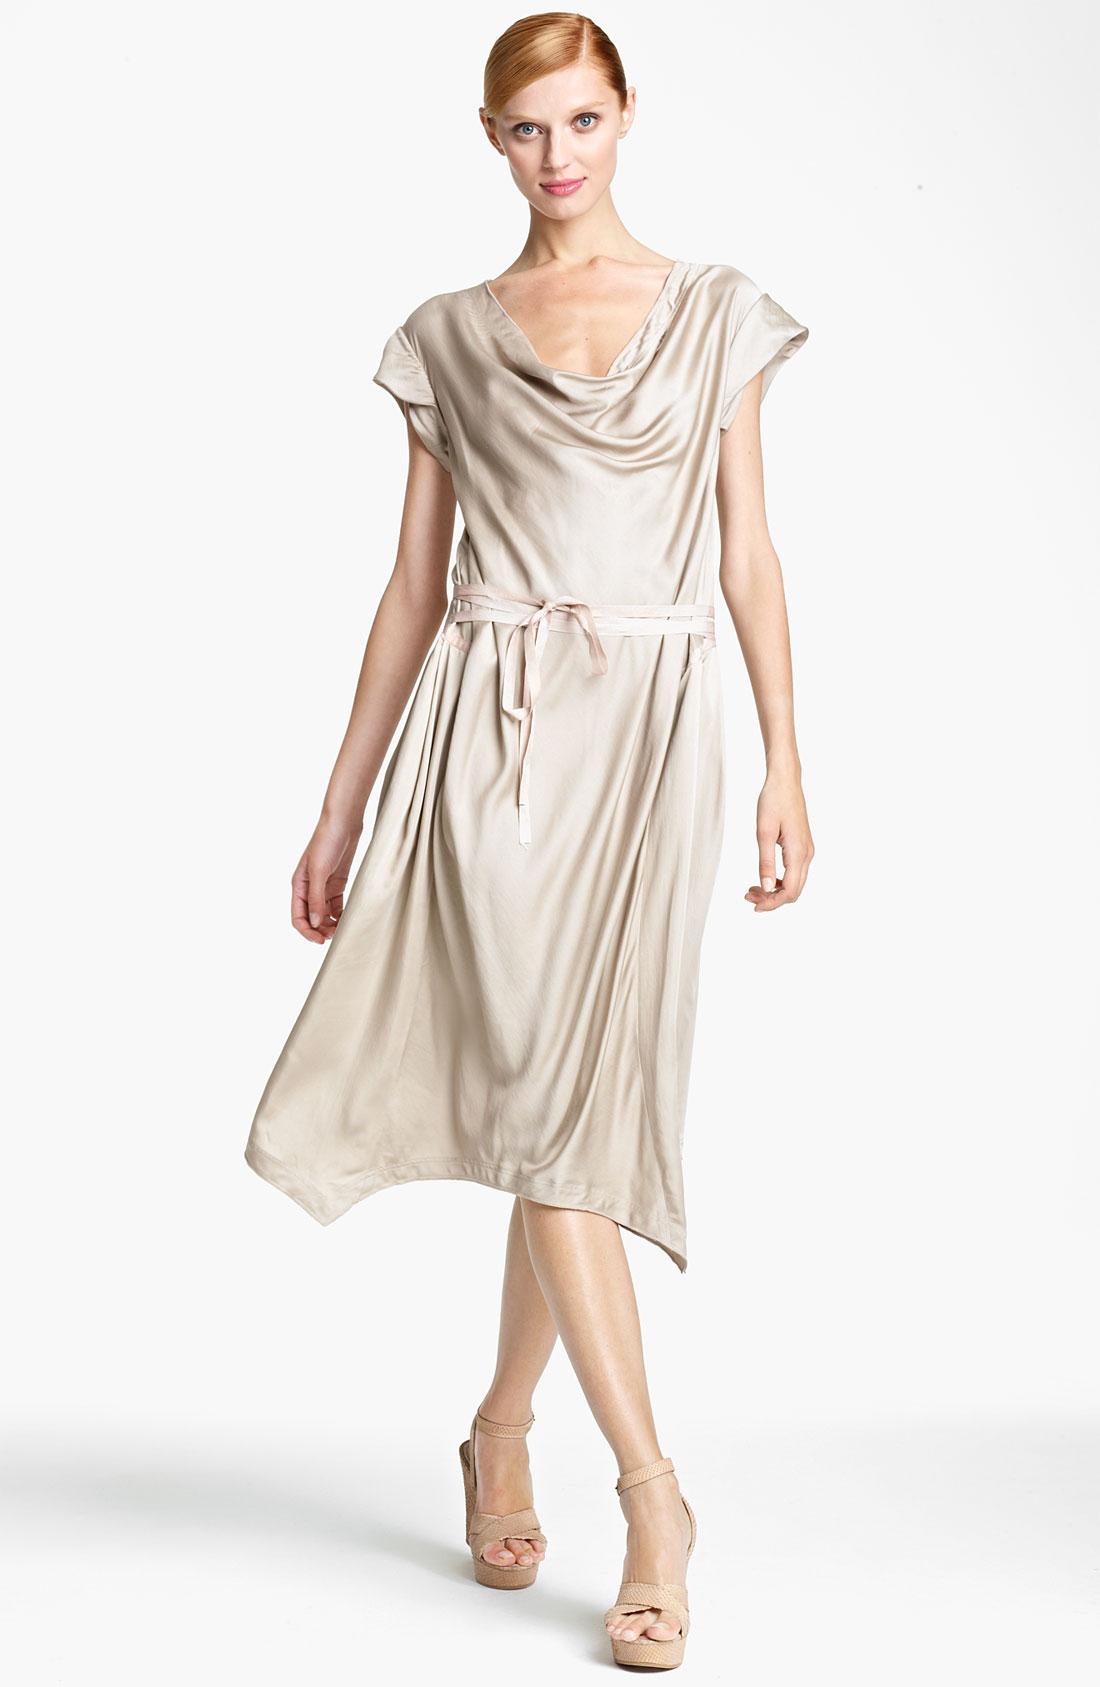 Donna Karan Wedding Dresses 2012